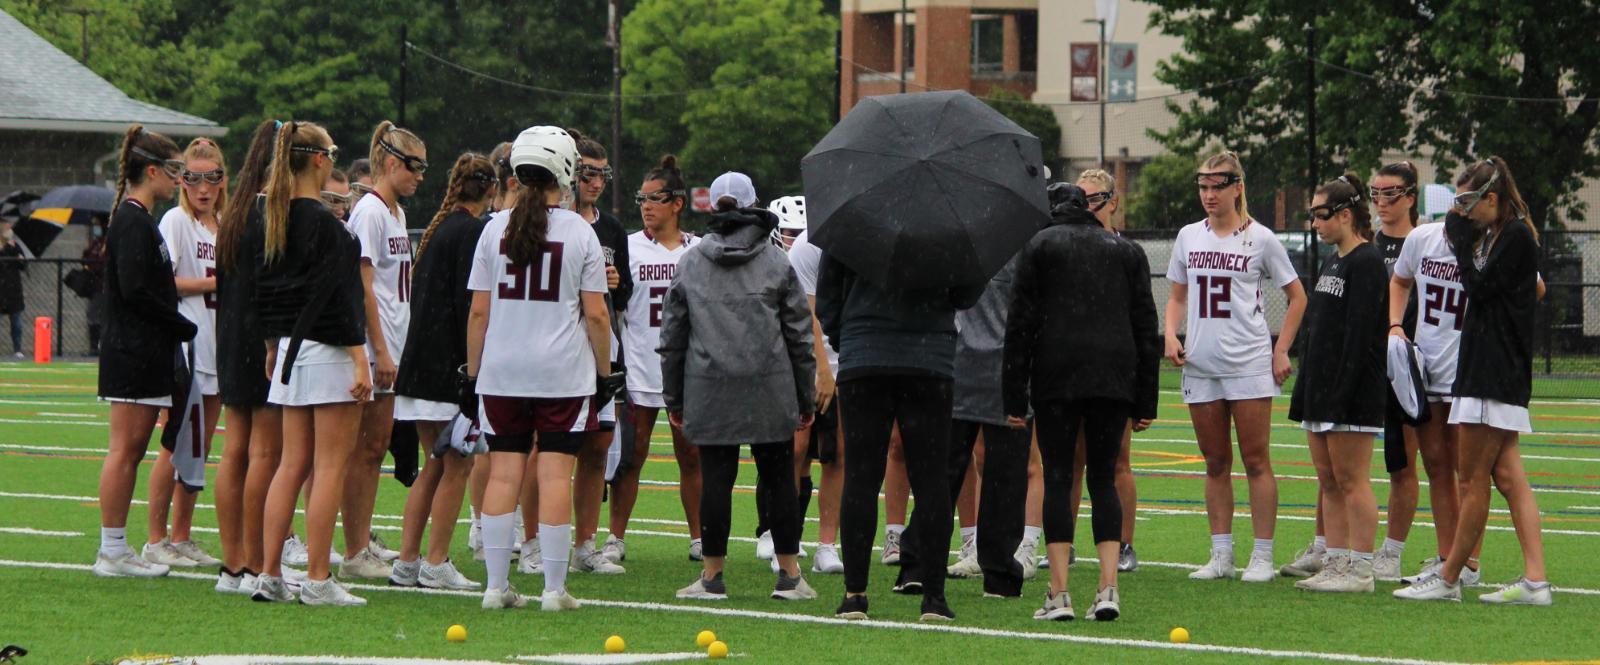 Girls Varsity Lacrosse vs. Severna Park 5/7/21